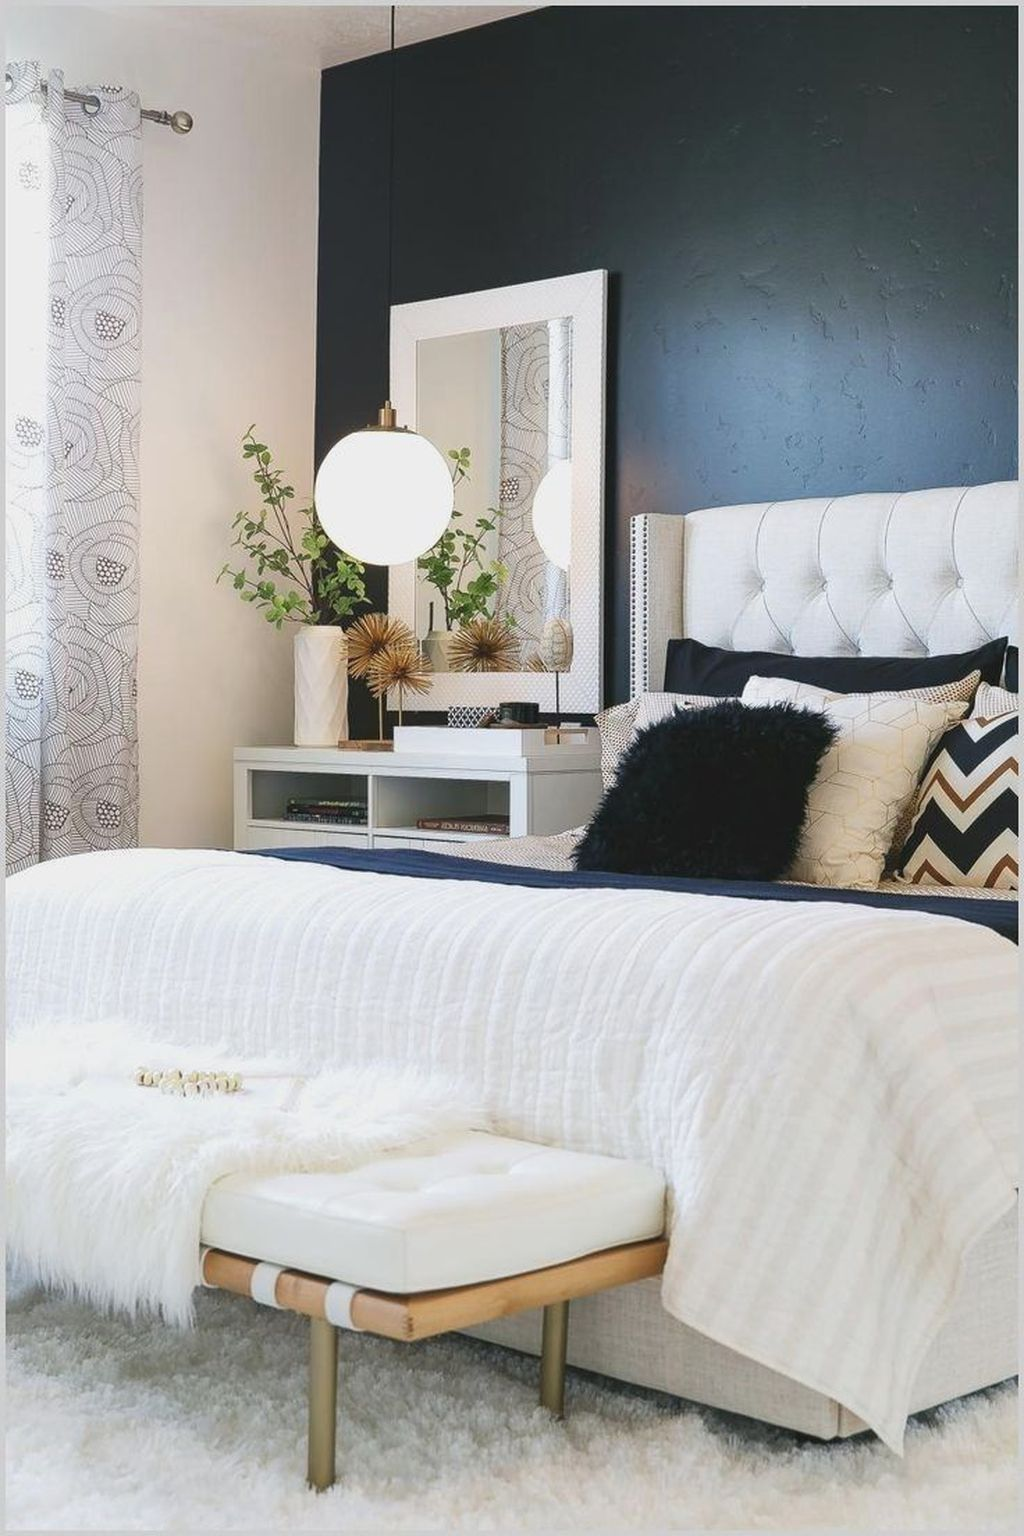 30+ Stunning Teenage Bedroom Decoration Ideas With Big Bed ...